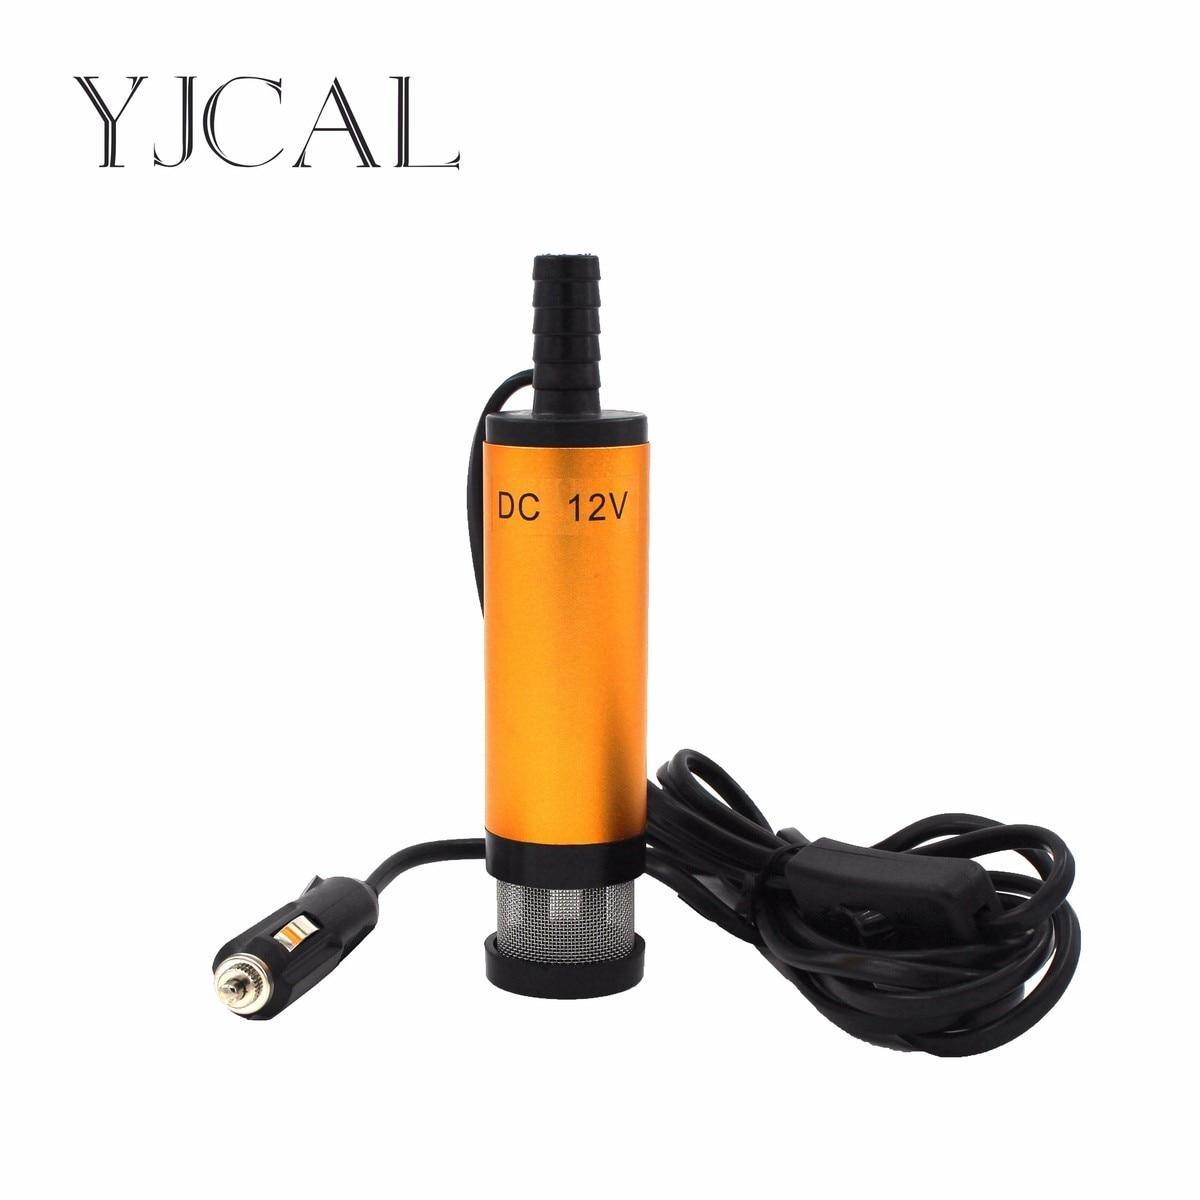 Vehicular Cigarette Plug Submersible Pump Diameter 38MM DC 12V/24V Motor Suction Water Oil Pump Stainless Steel Band Strainer